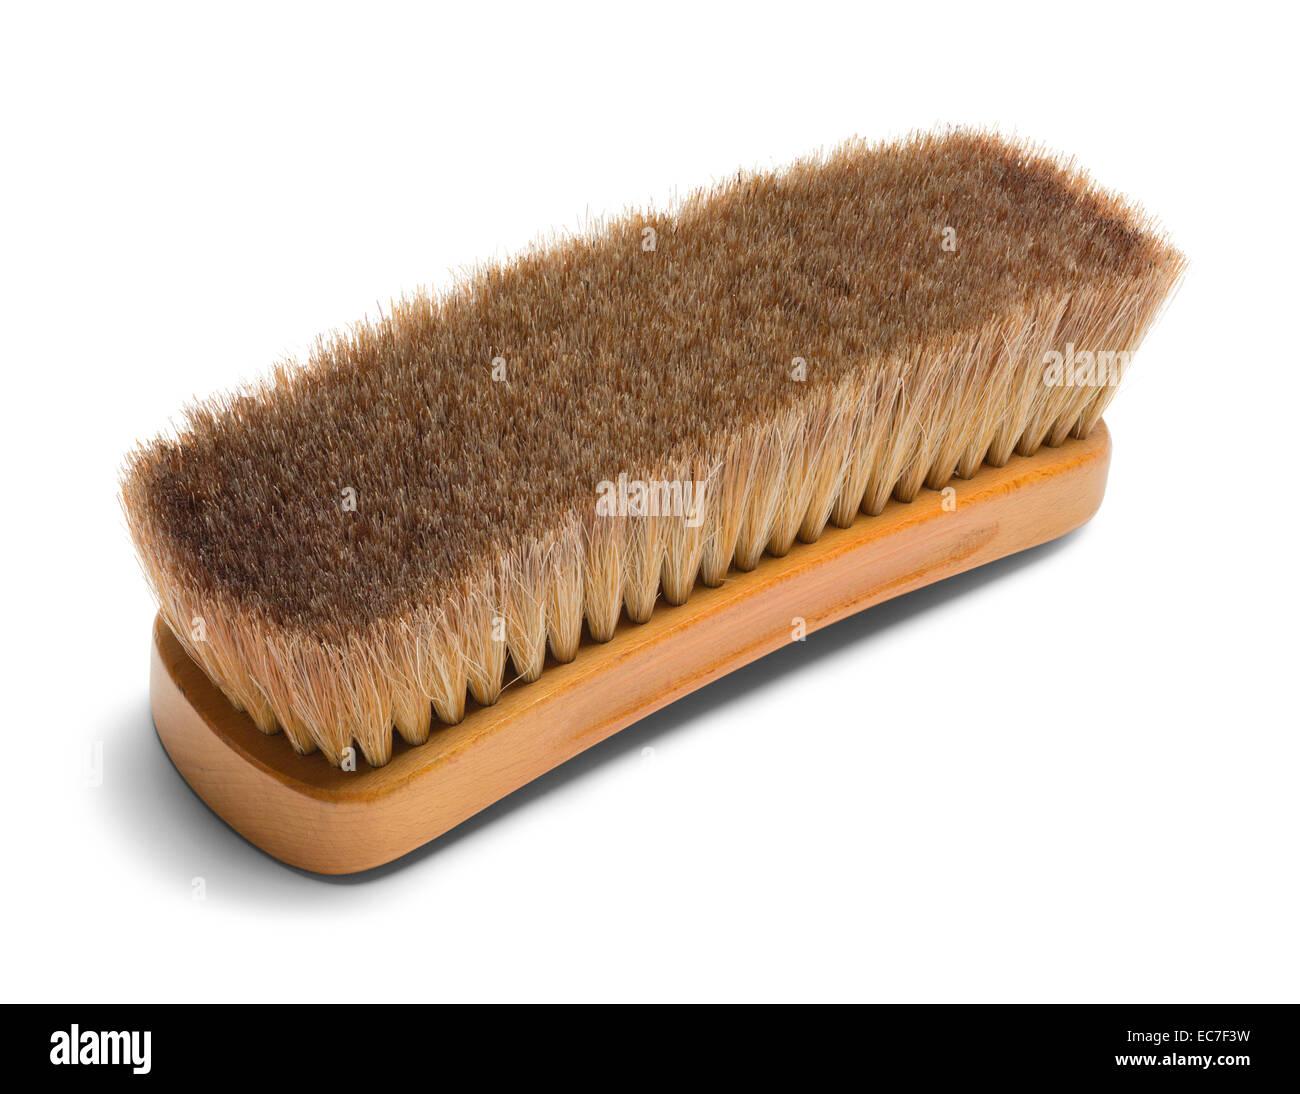 Large Brown Horse Hair Shoe Brush Isolated on White Background. - Stock Image